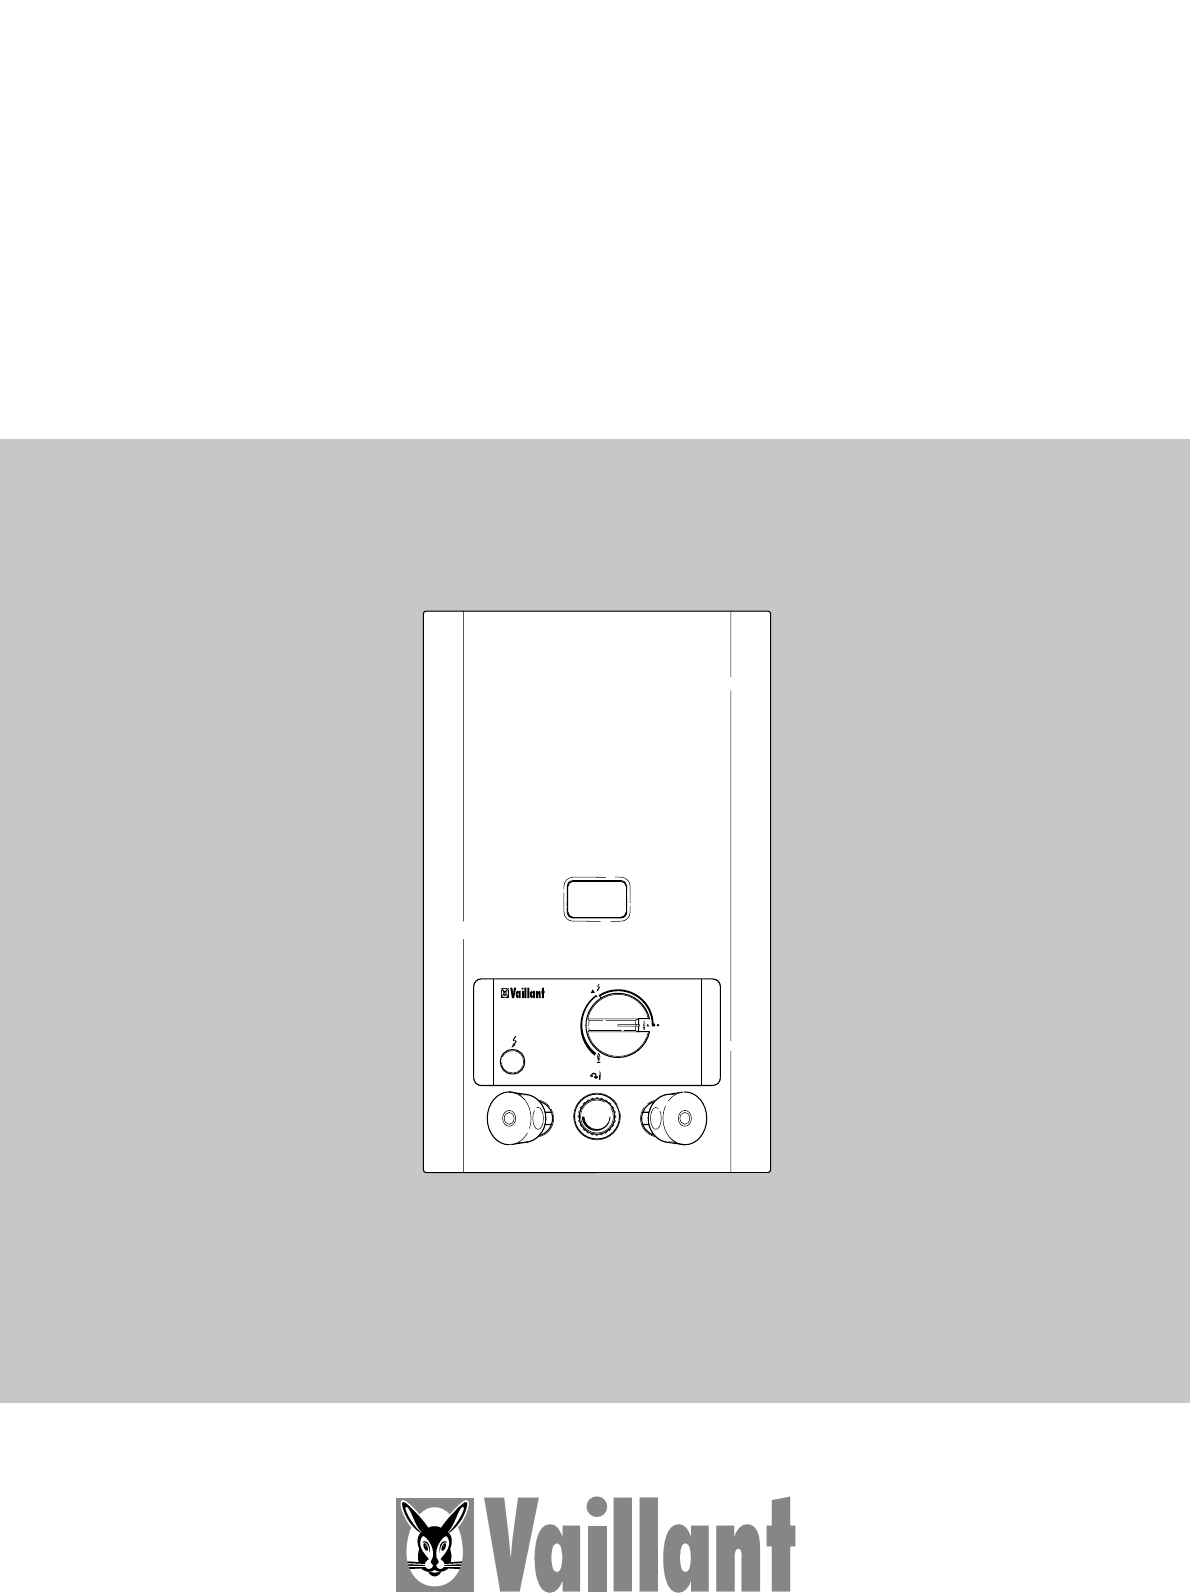 manual vaillant mag nl 9 1 oz dg page 1 of 24 dutch. Black Bedroom Furniture Sets. Home Design Ideas